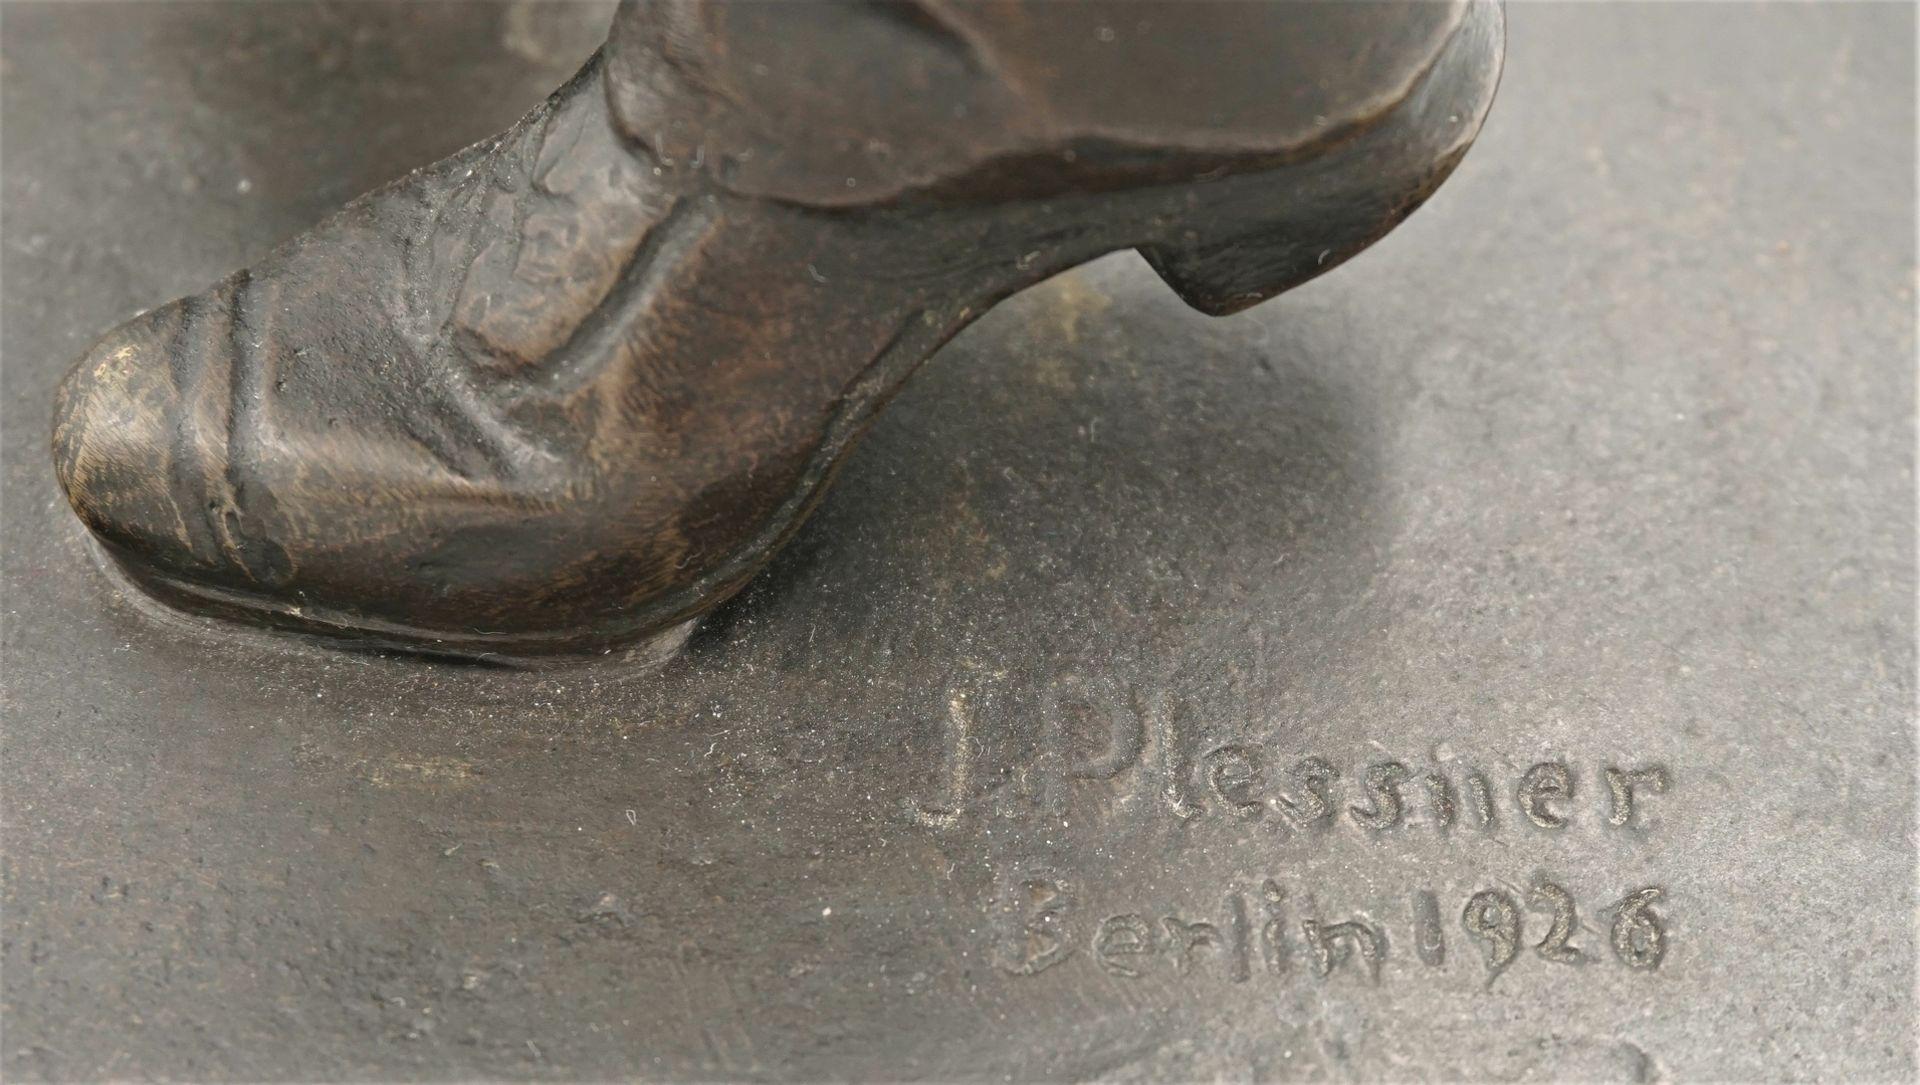 Jacob Plessner, Bücherwurm - Bild 5 aus 5